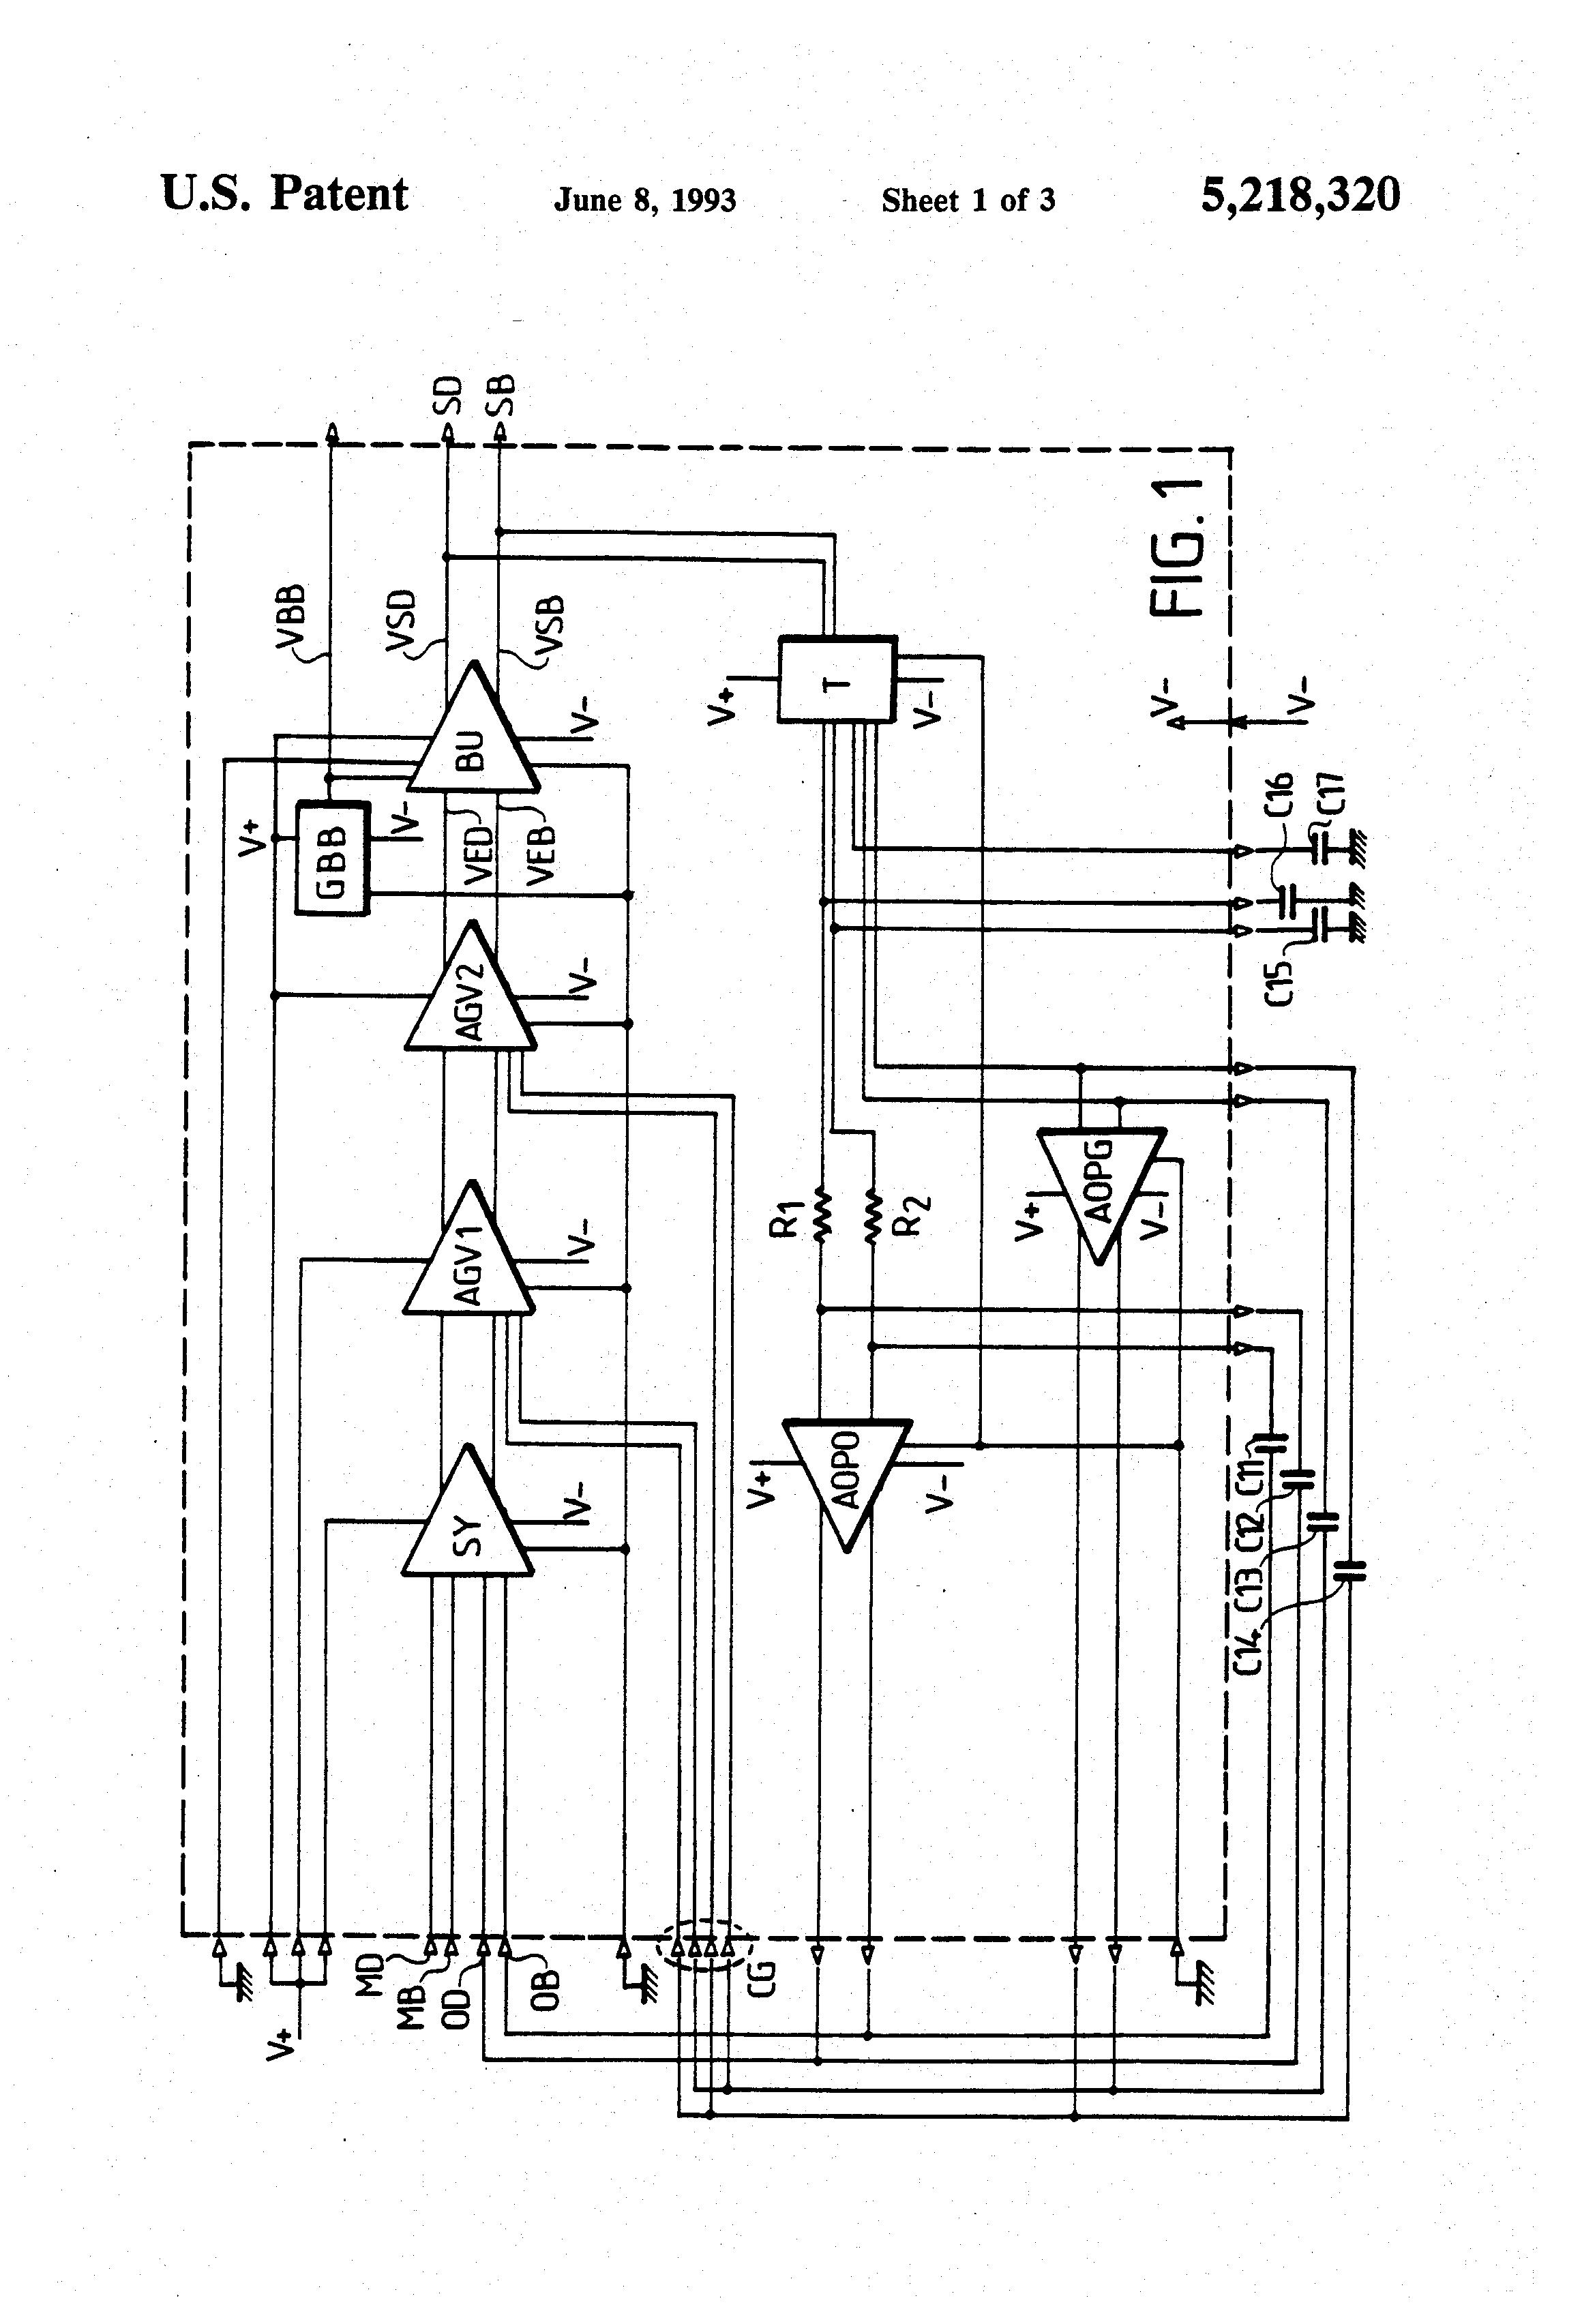 30dbm Wideband Amplifier Circuit Amplifiercircuit Diagram Seekiccom Patent Us5218320 Having